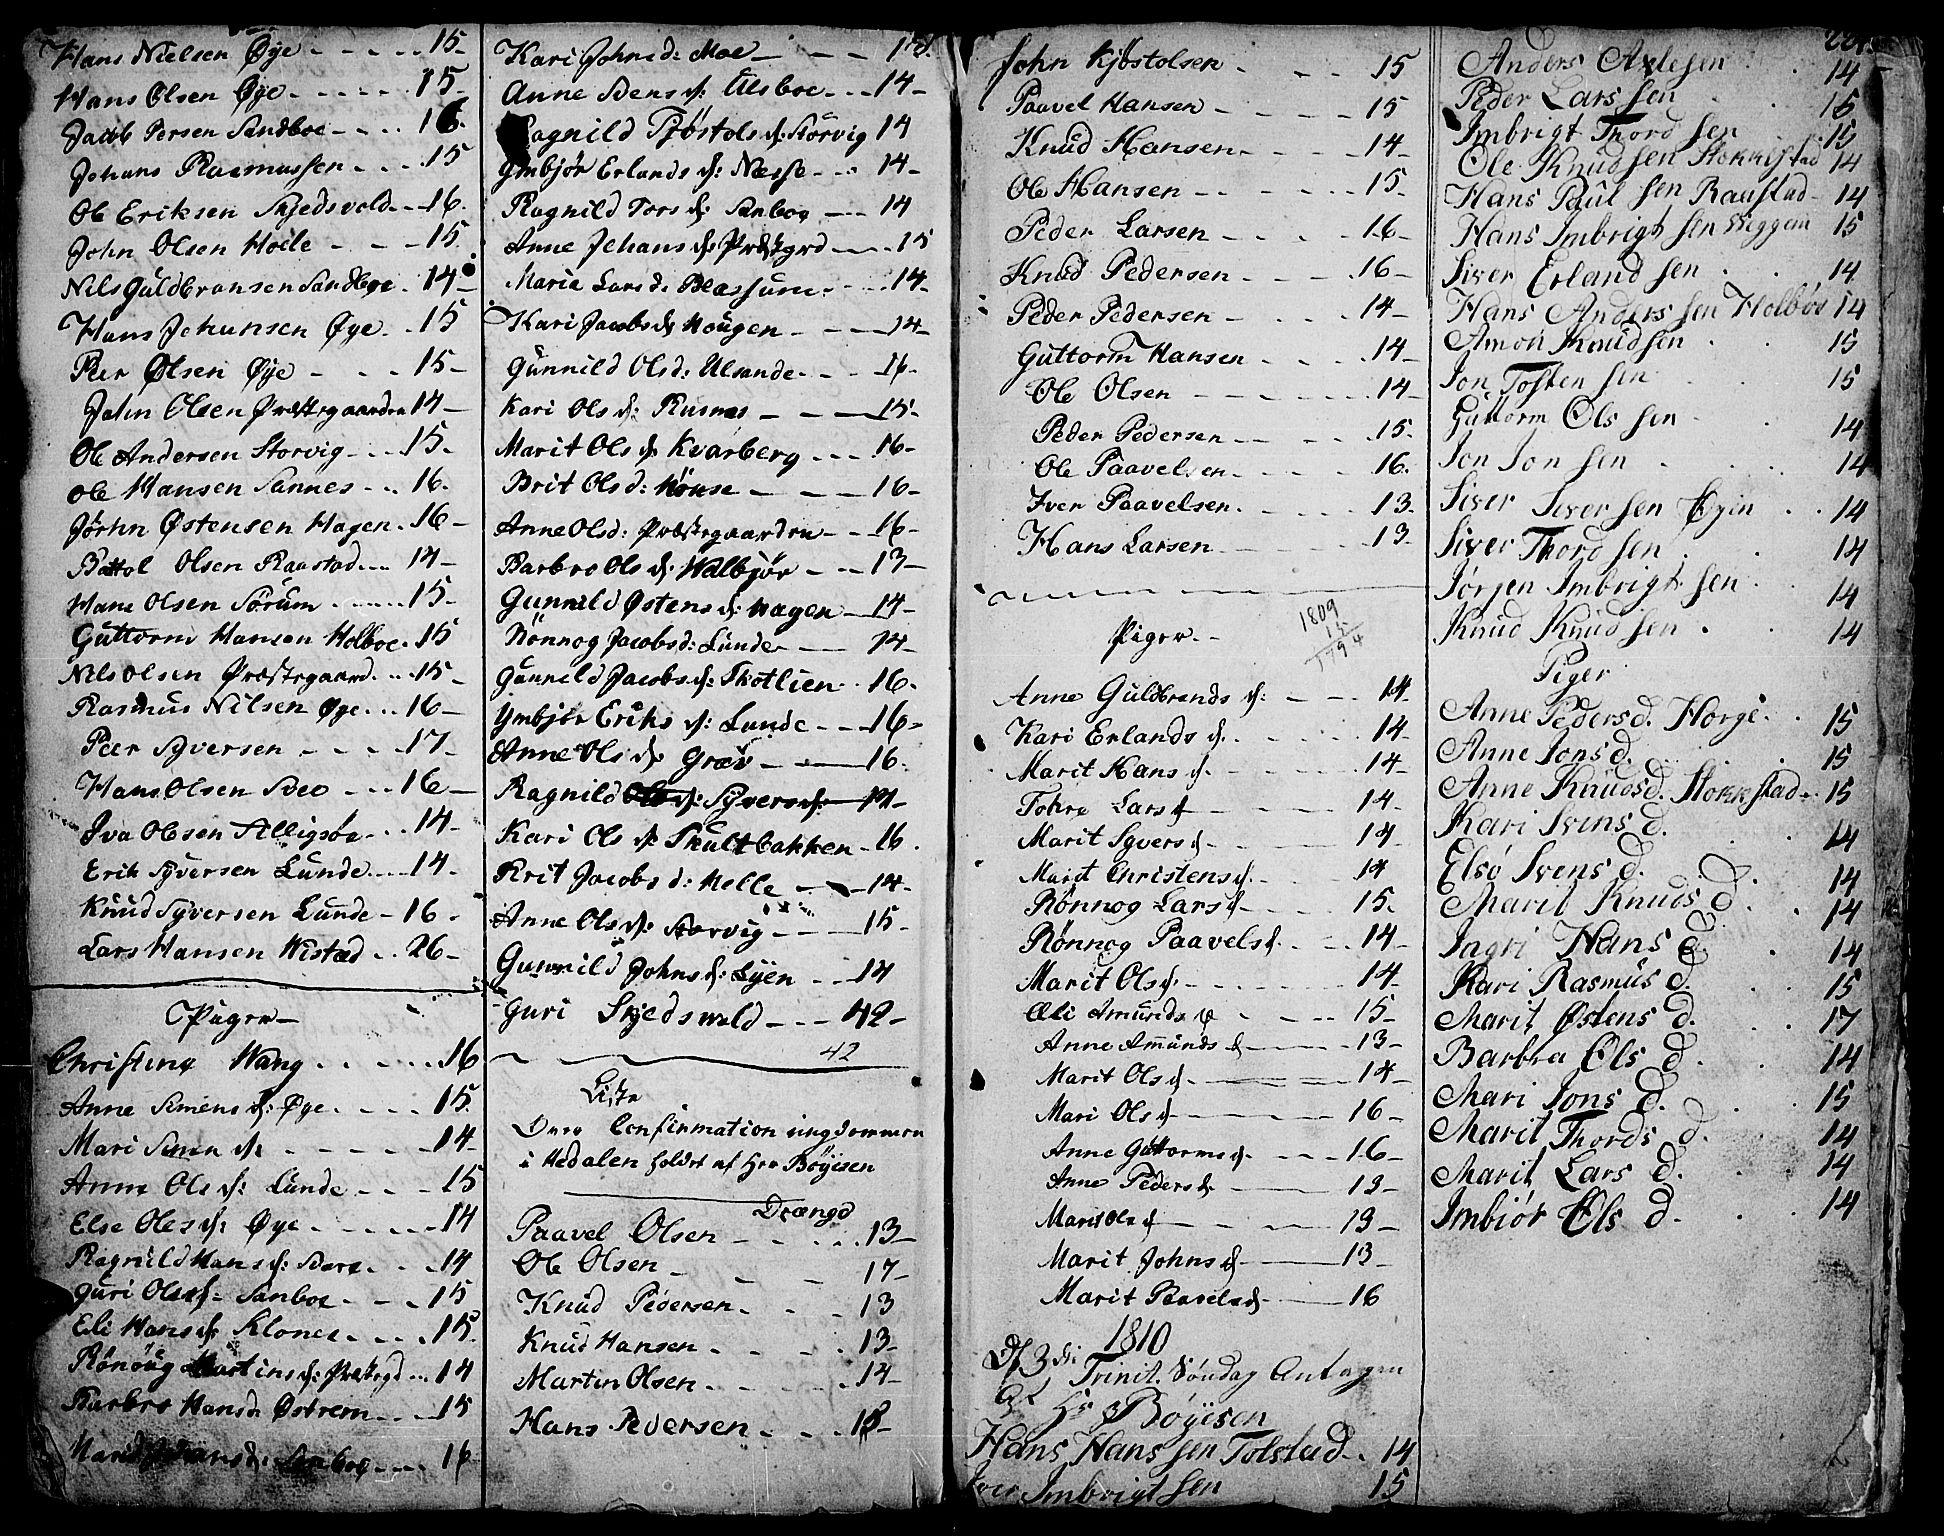 SAH, Vågå prestekontor, Ministerialbok nr. 1, 1739-1810, s. 224